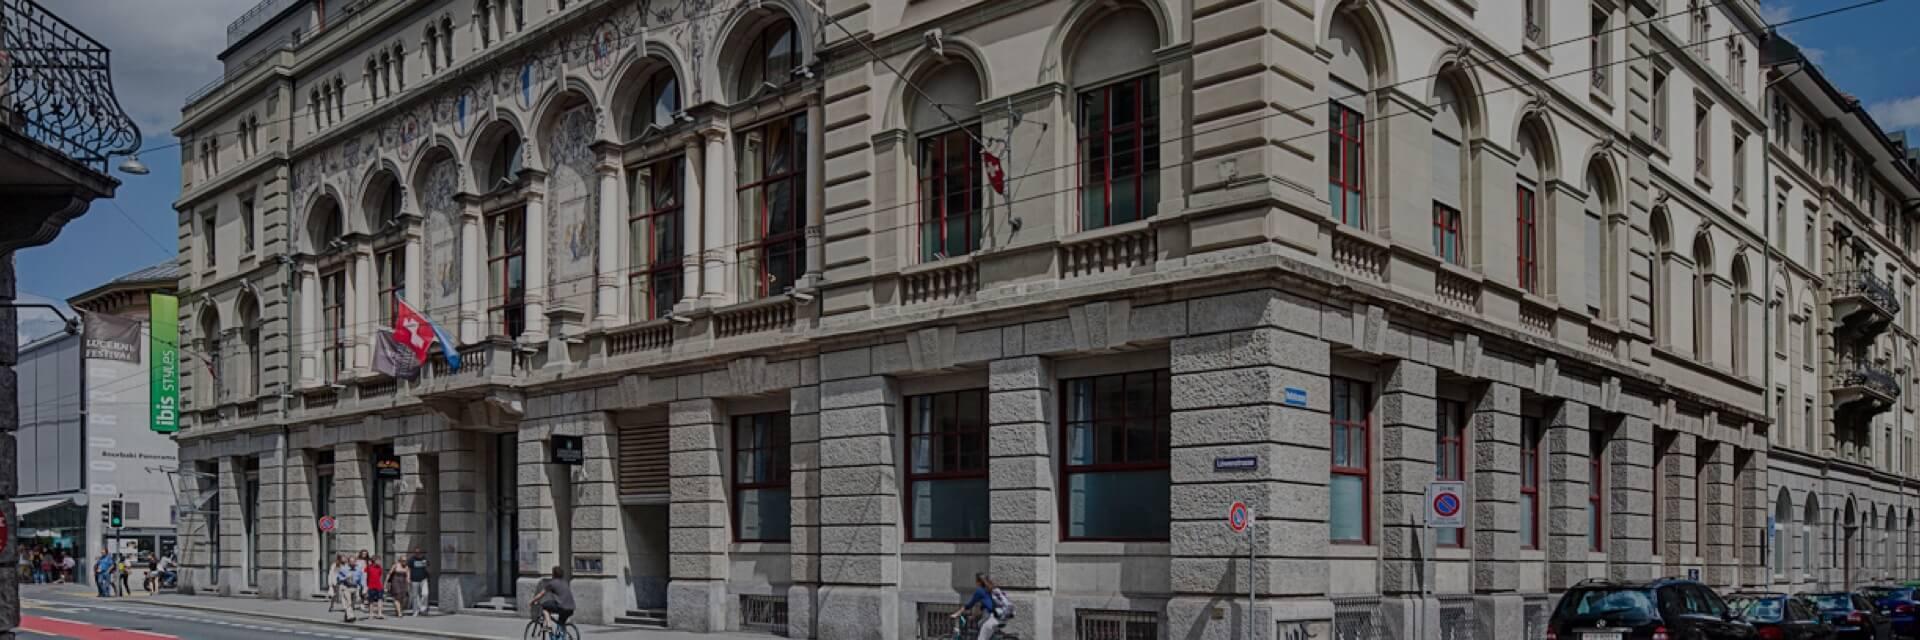 César Ritz Colleges